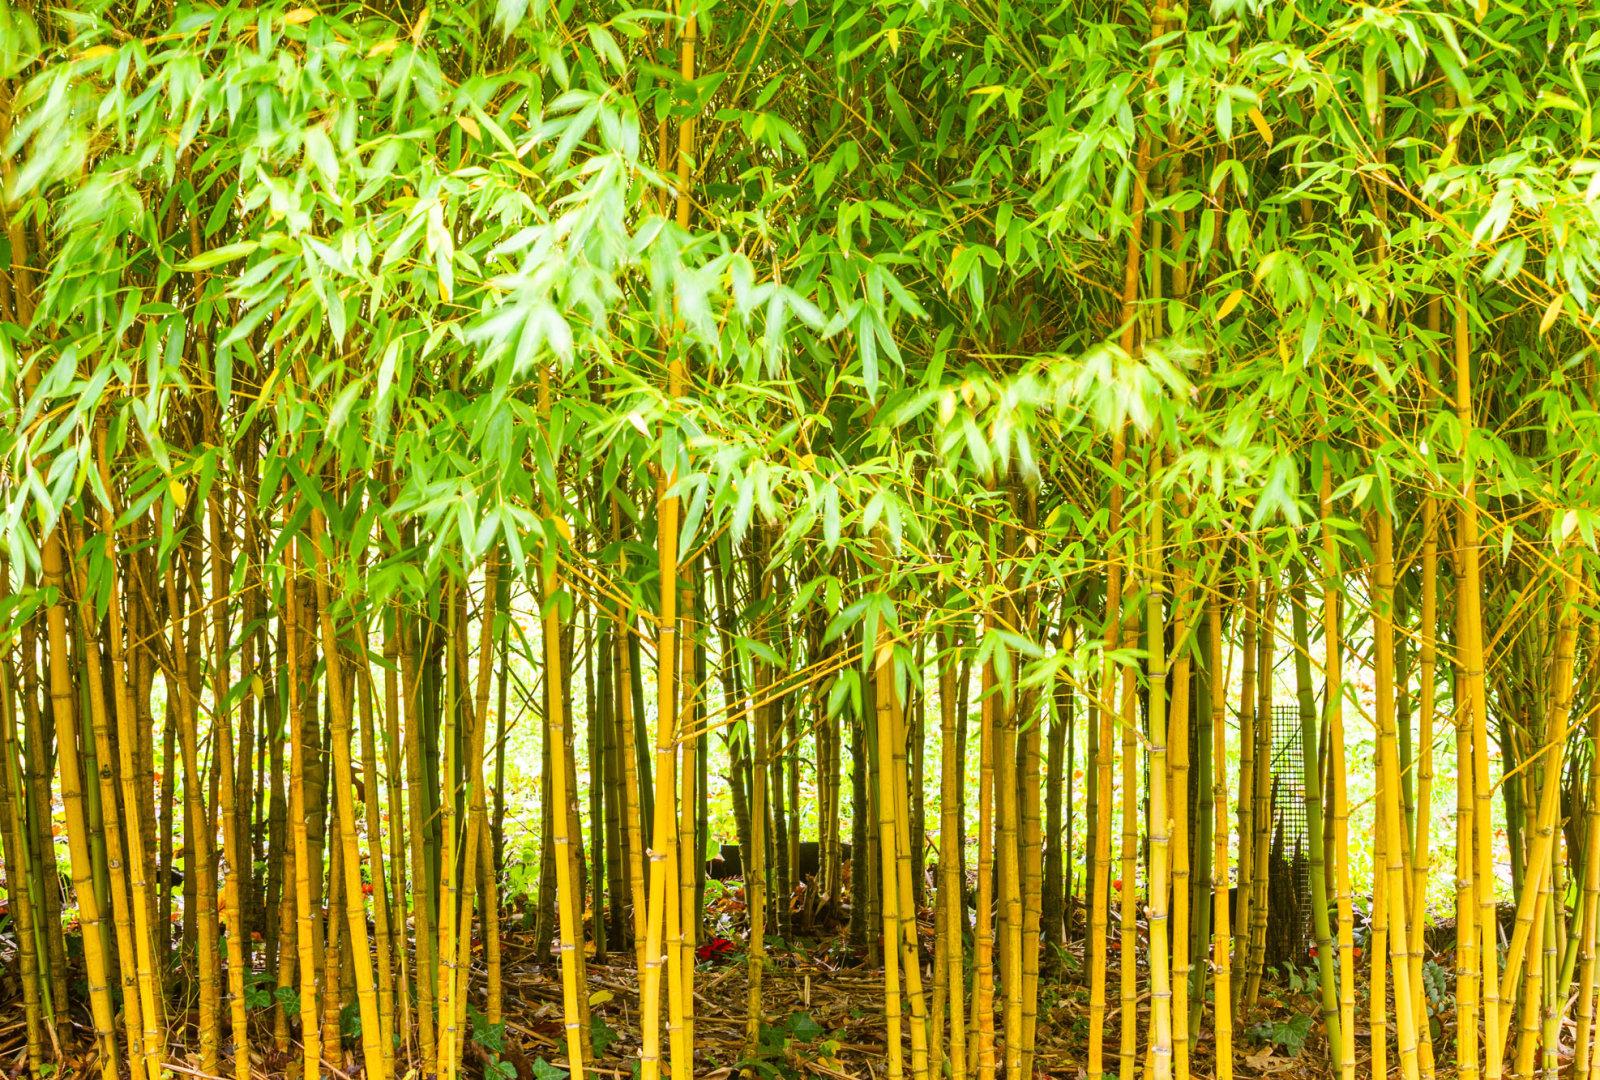 Phyllostachys aurea 'Holochrysa' bamboo at trebah